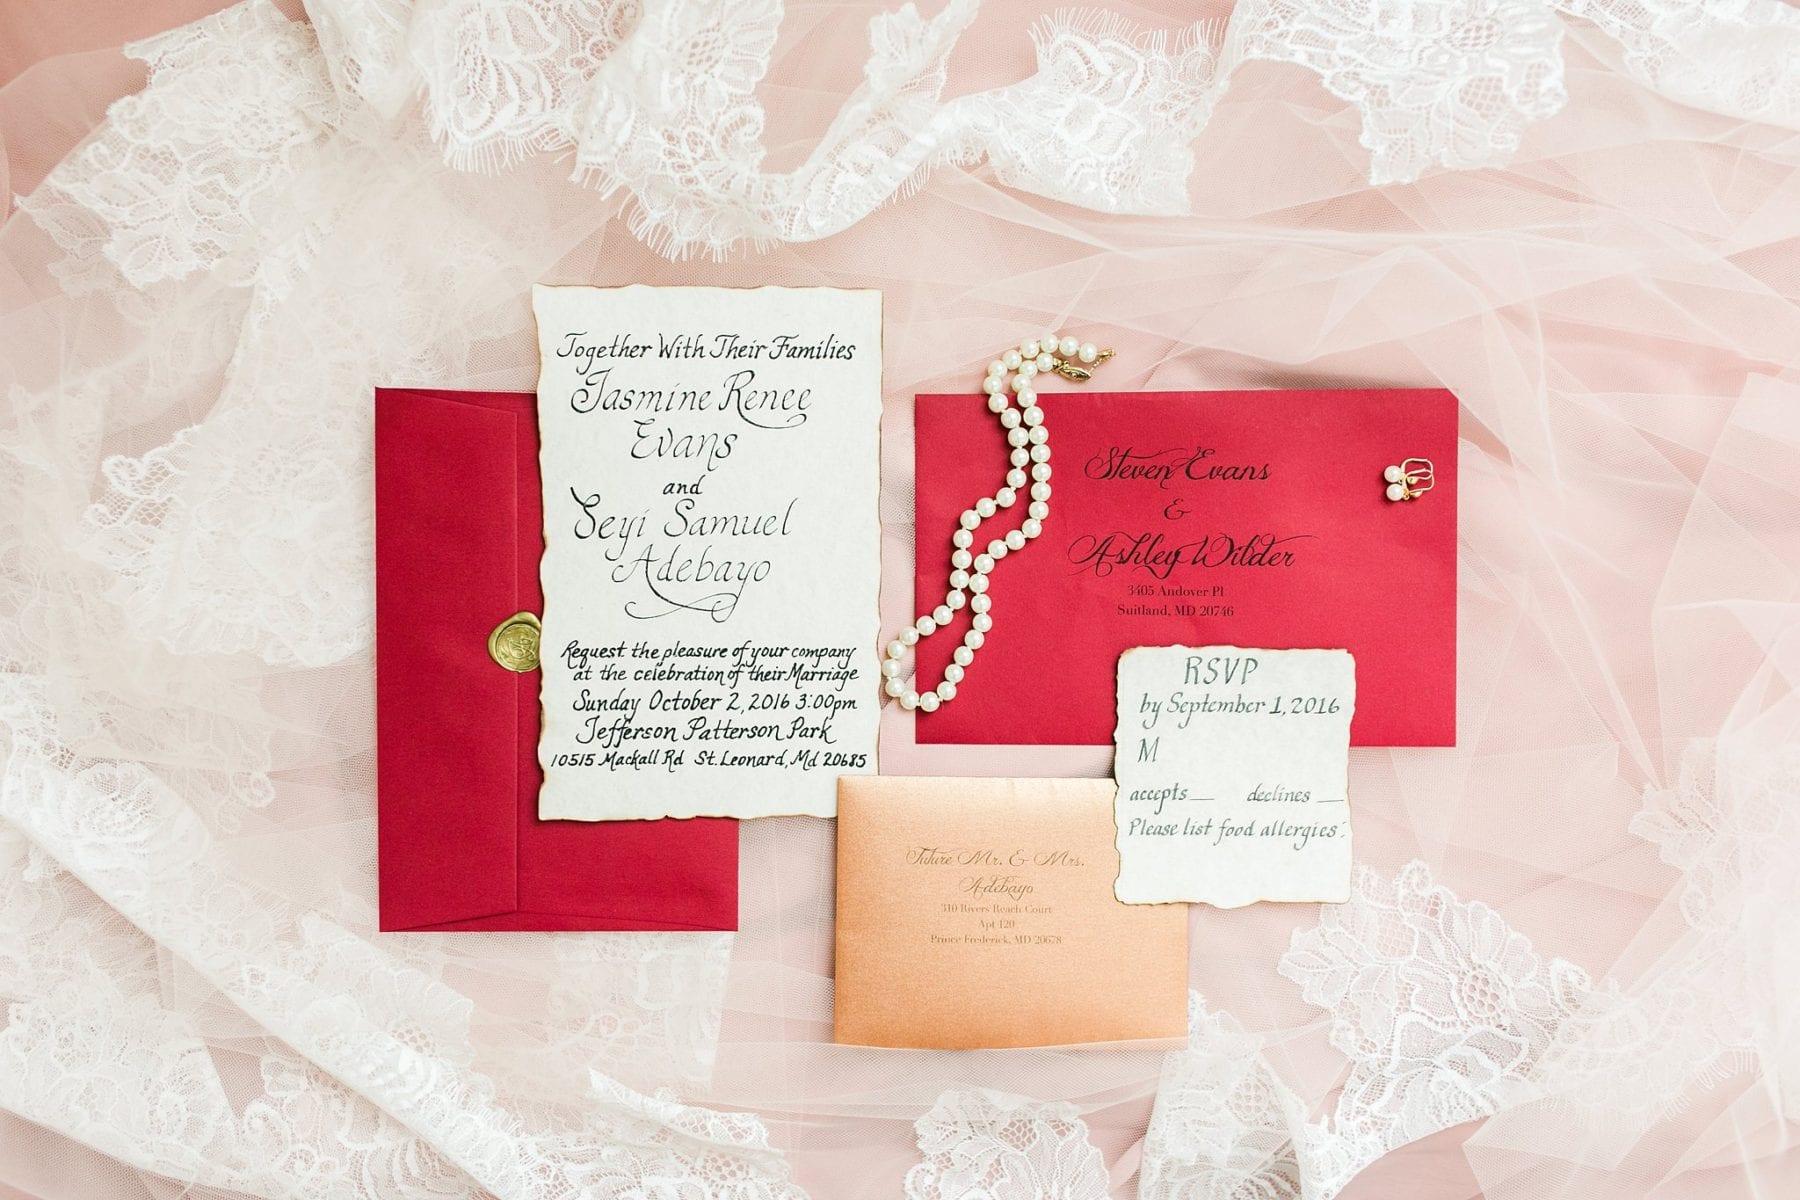 Jefferson Patterson Park Wedding | Jasmine & Seyi